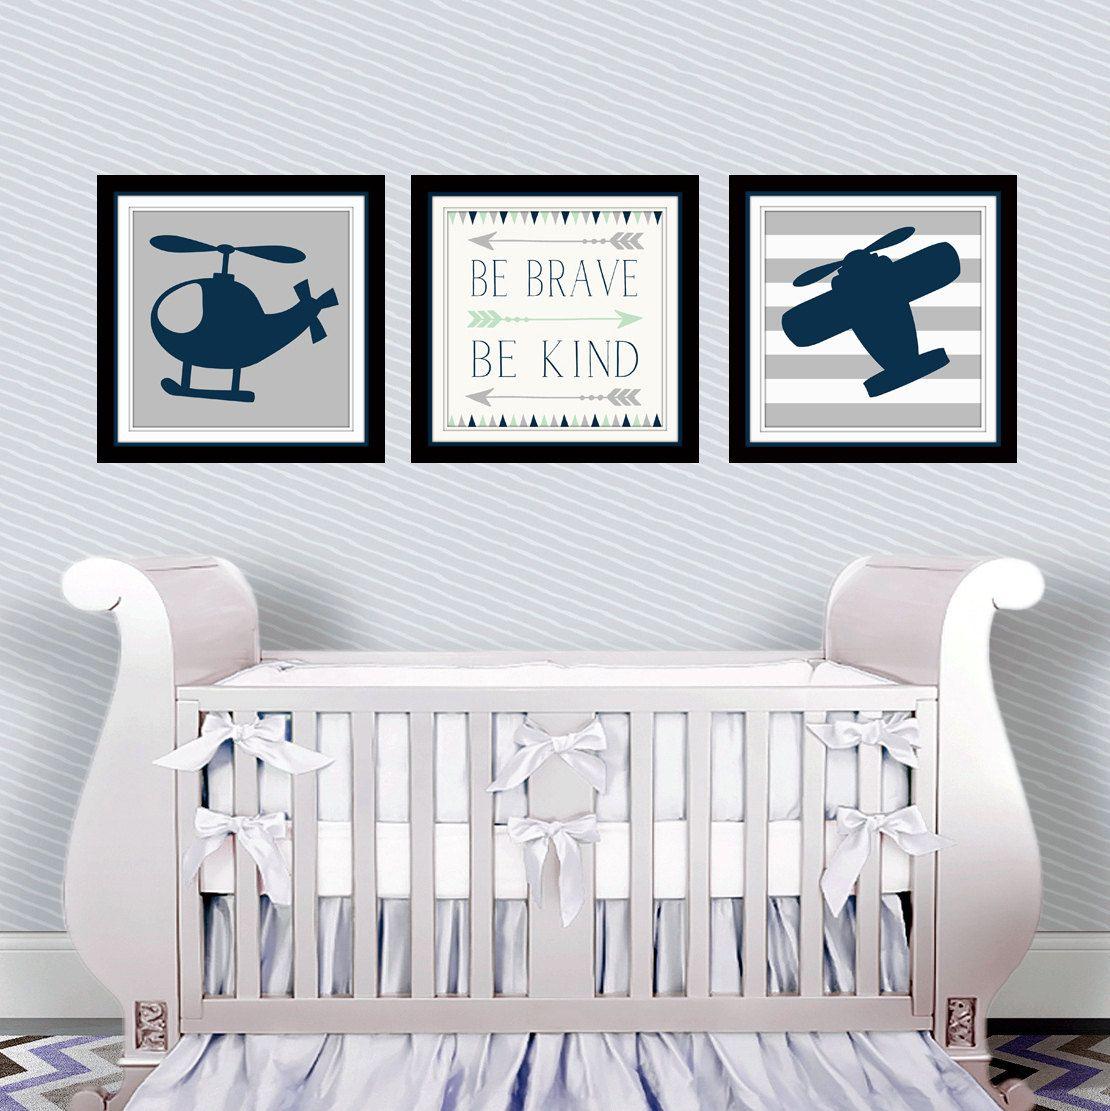 Aviation Nursery Decor Baby Boy Nursery Boys Aviation Wall Art Be Brave Be Kind Airplane Aviation Nursery Decor Baby Boy Nursery Decor Aviation Nursery